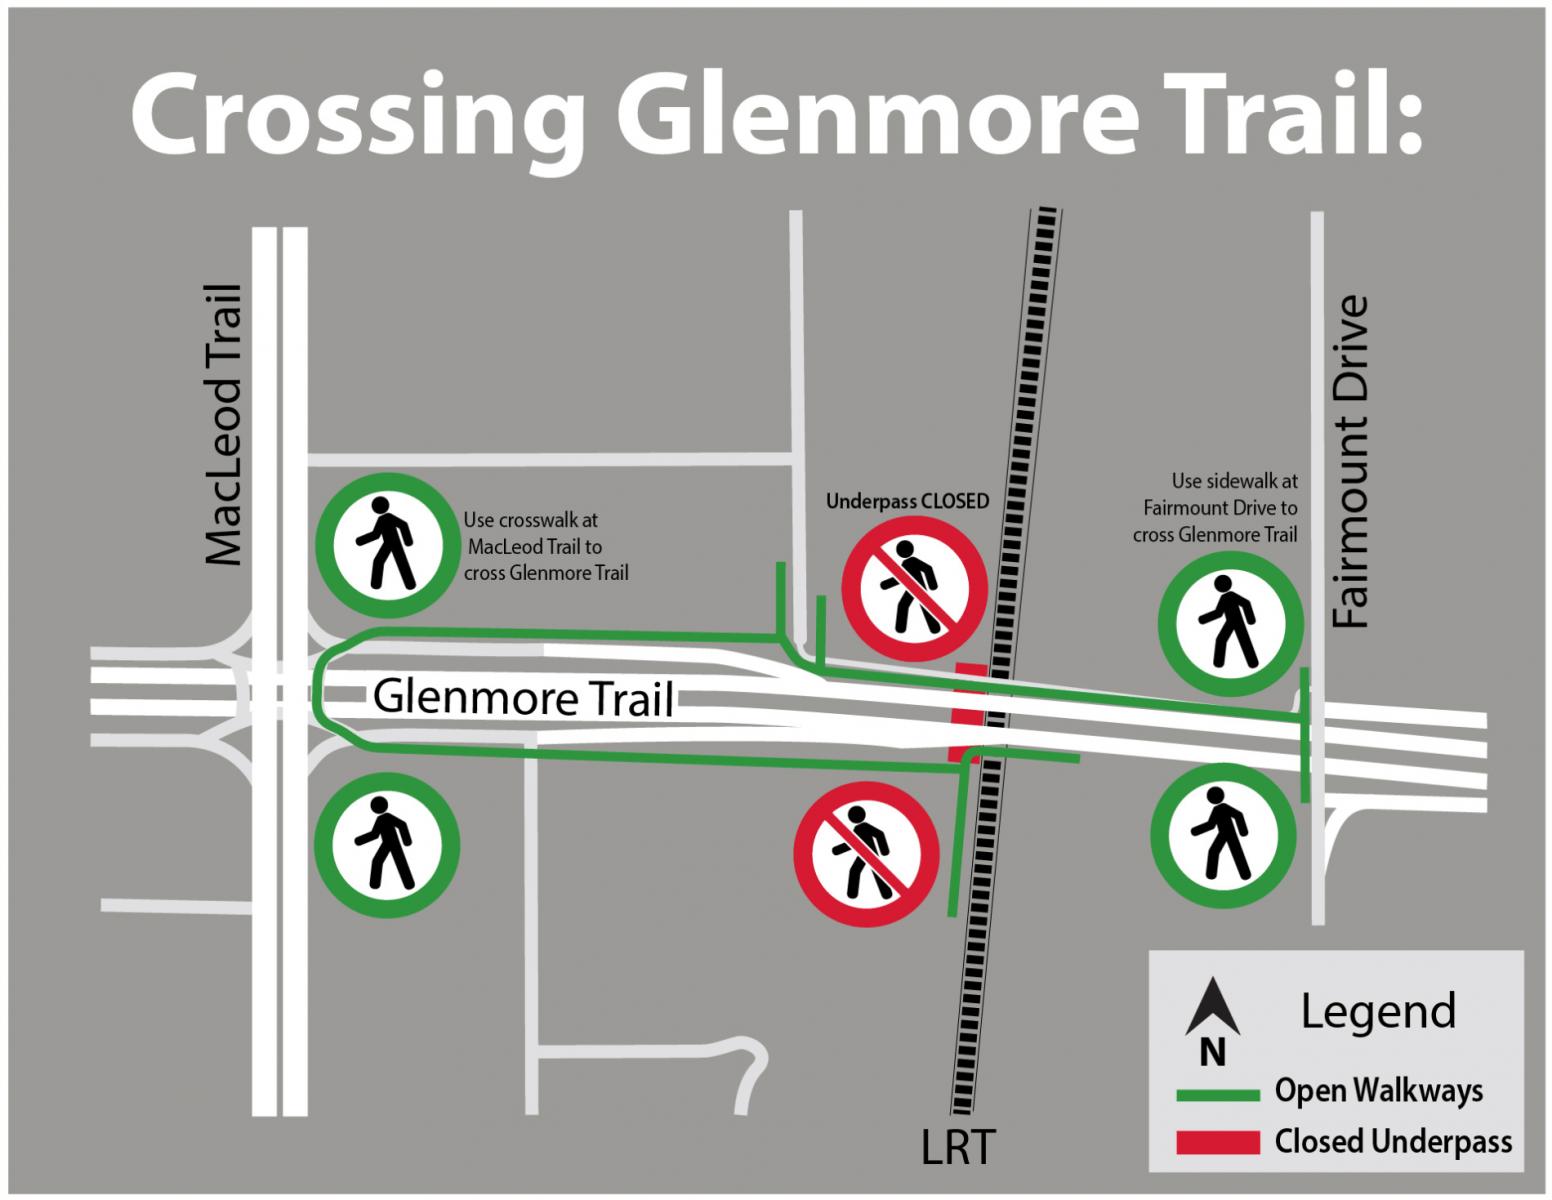 glenmore trail